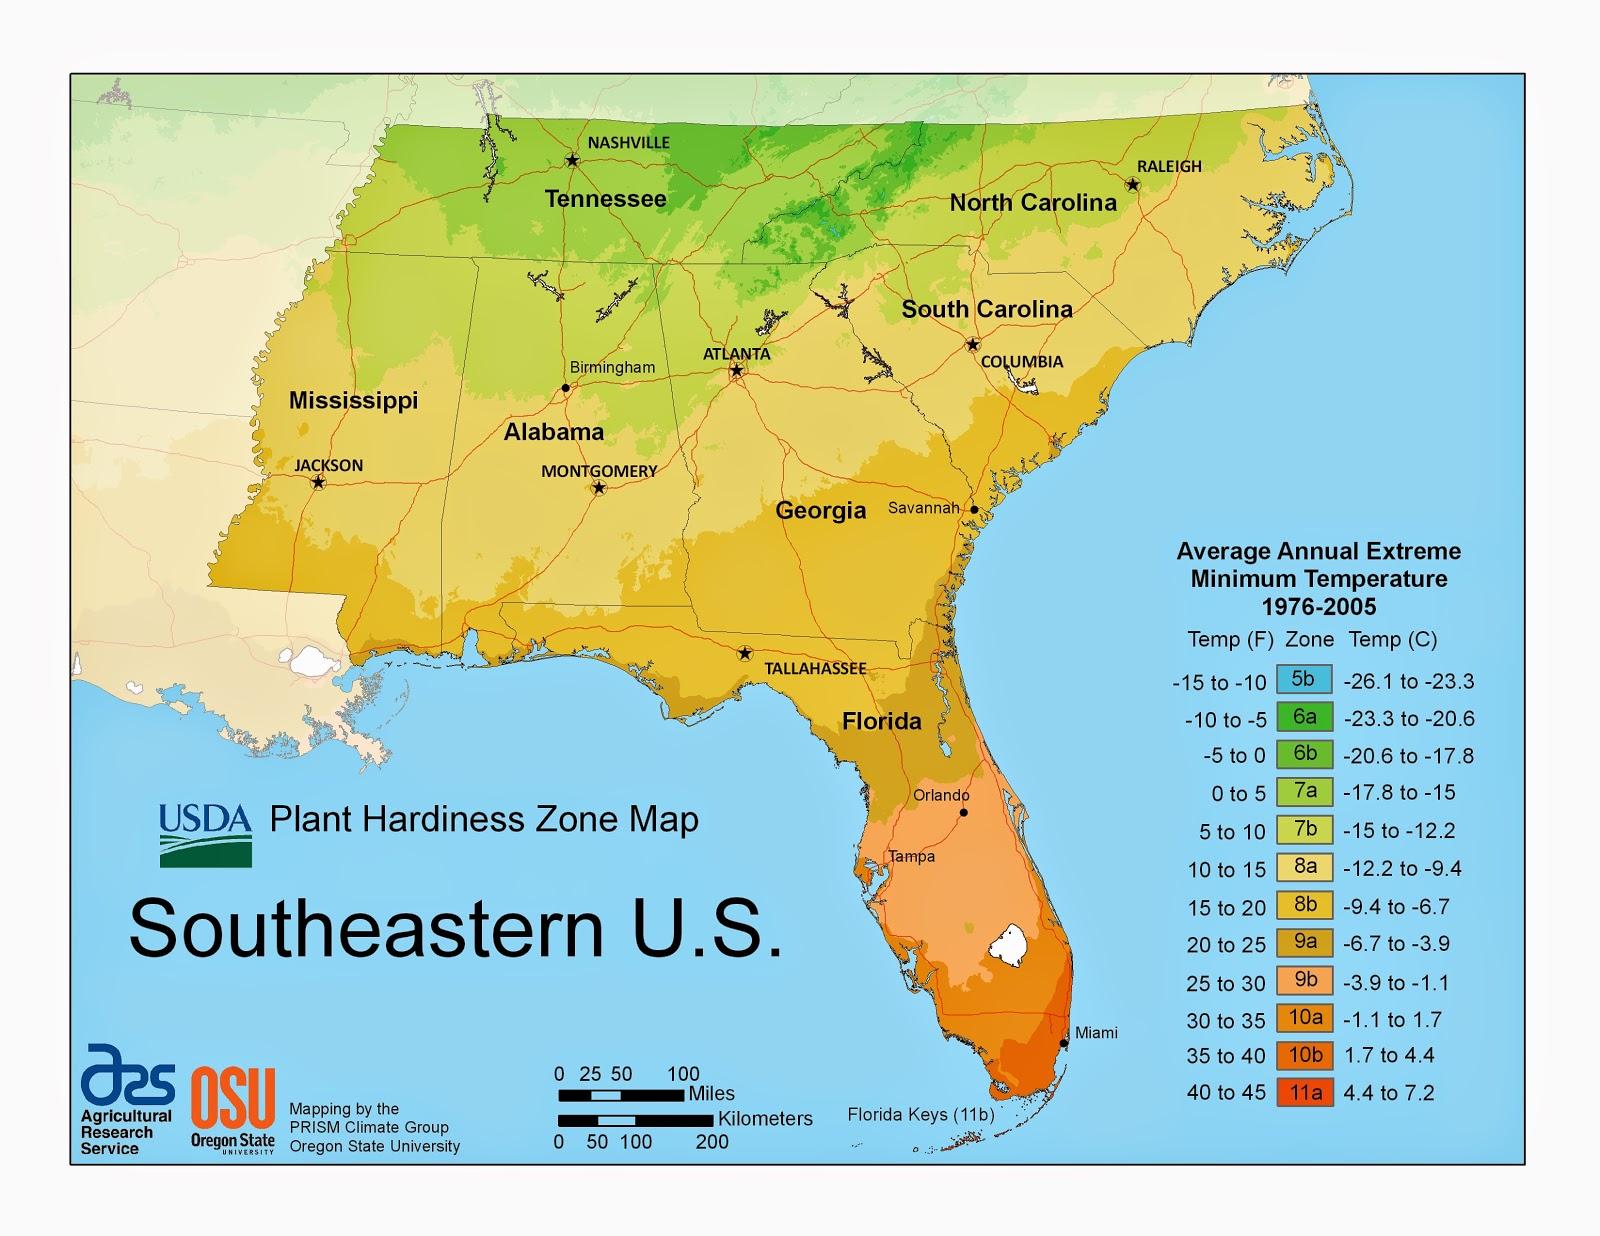 Purple Iris Perspective USDA Plant Hardiness Zones Regional Maps - Us growing zones map